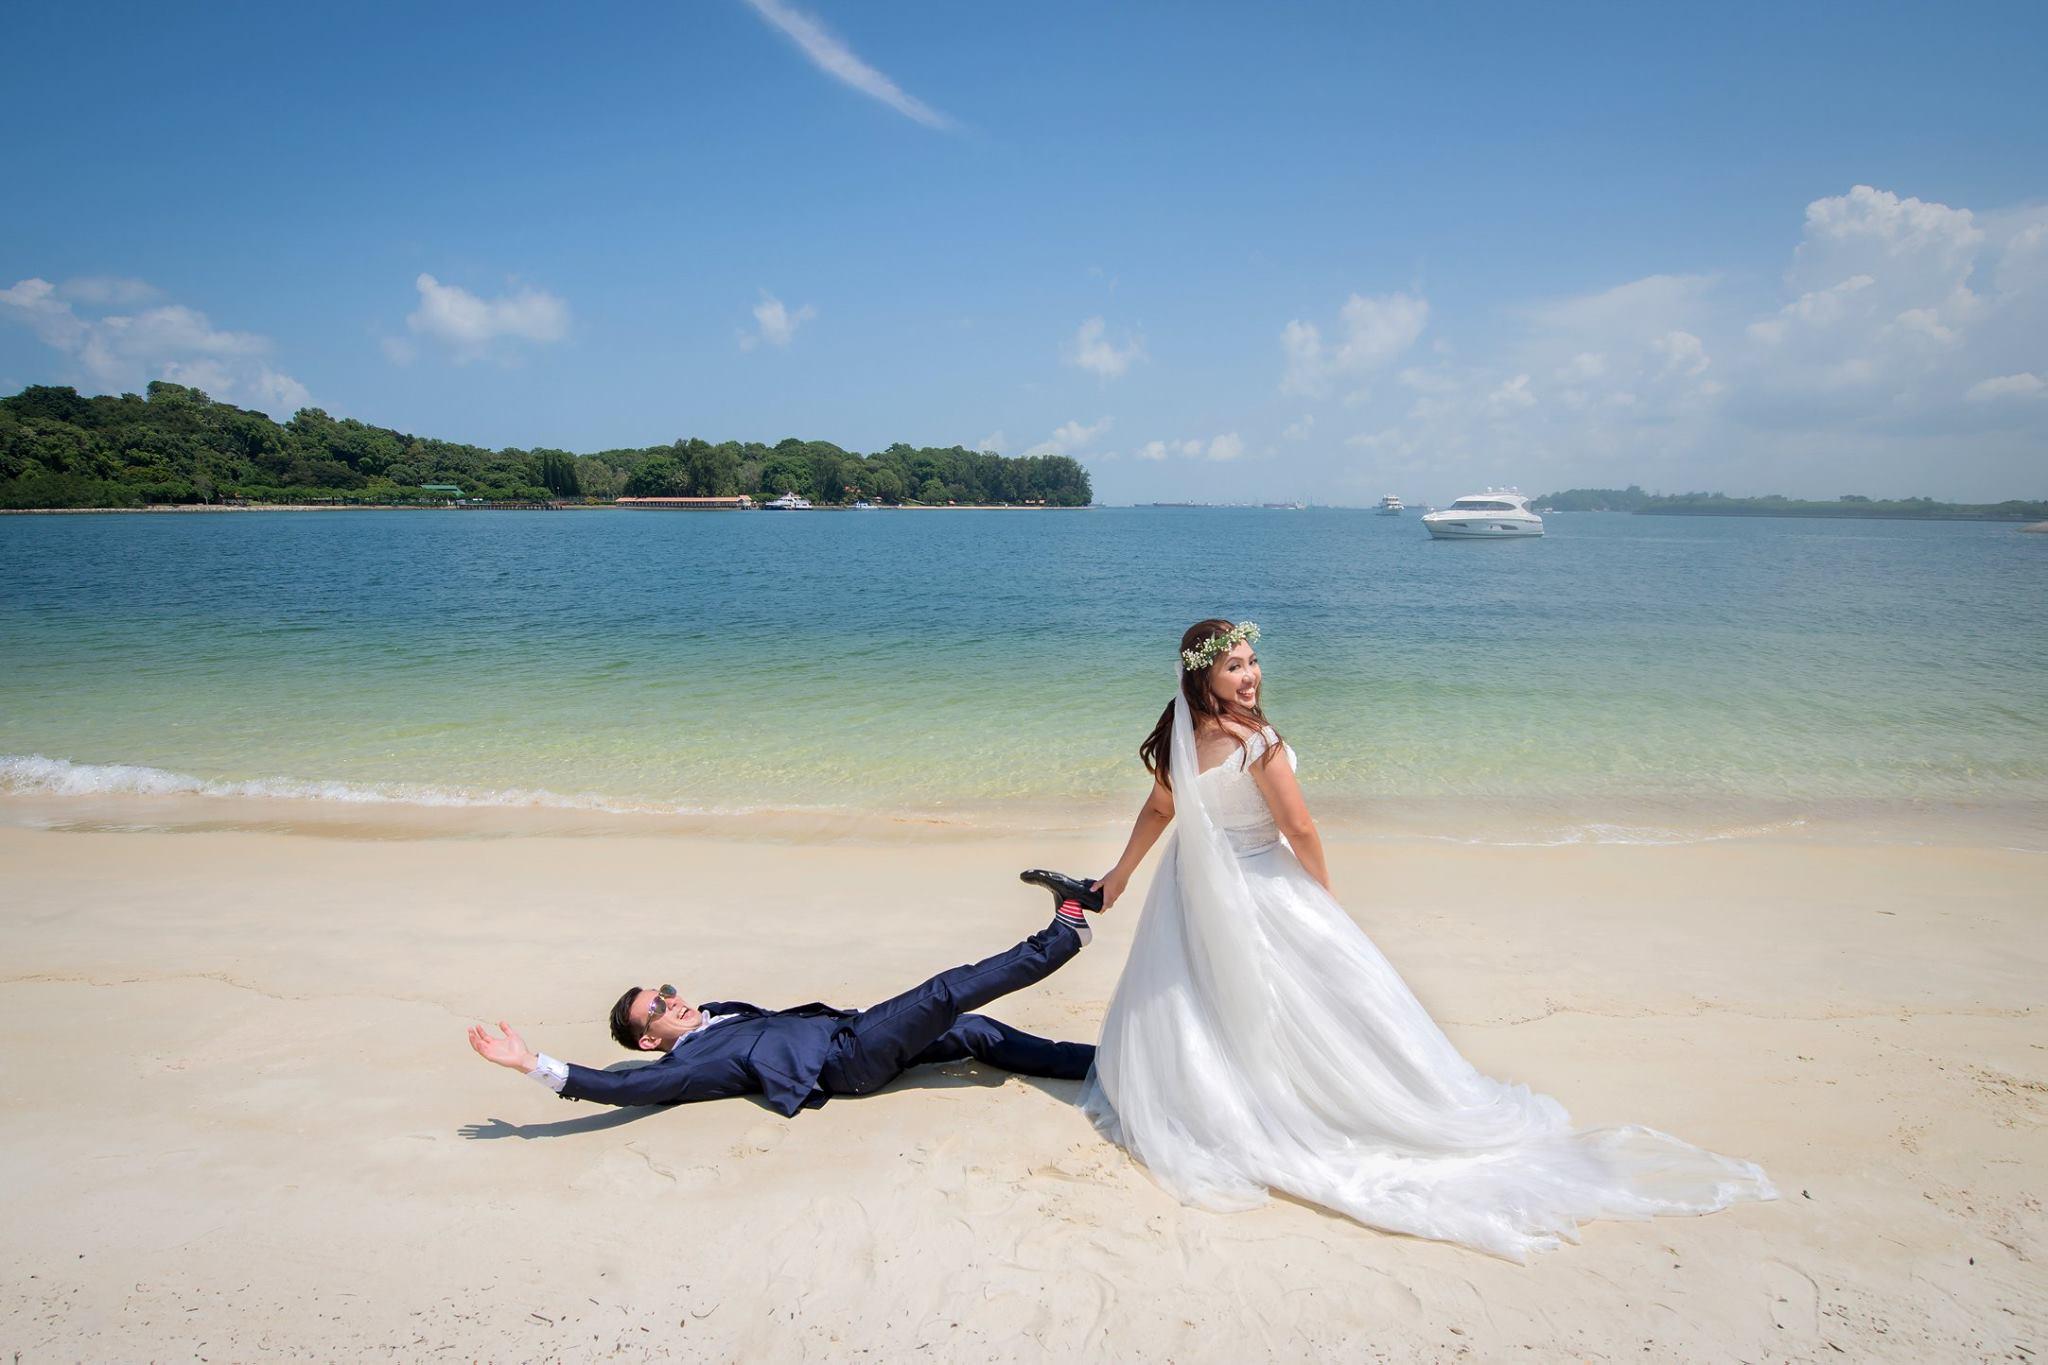 St John Island Lazarus Island Pre Wedding Shoot by GrizzyPix Photography | Bridestory.com